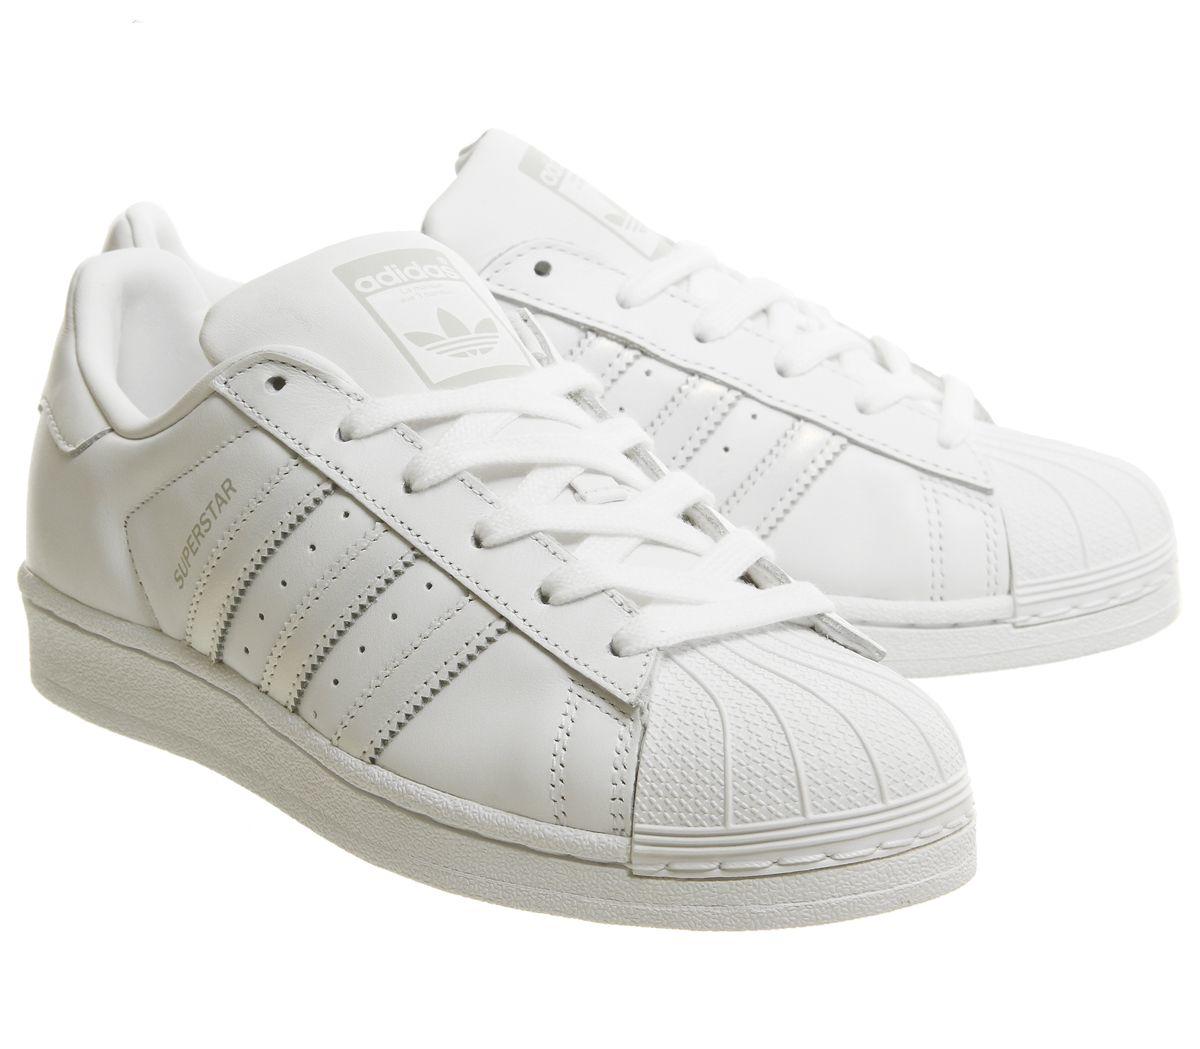 Dettagli su Donna adidas Superstar 1 Bianco Grigio Scarpe da Ginnastica